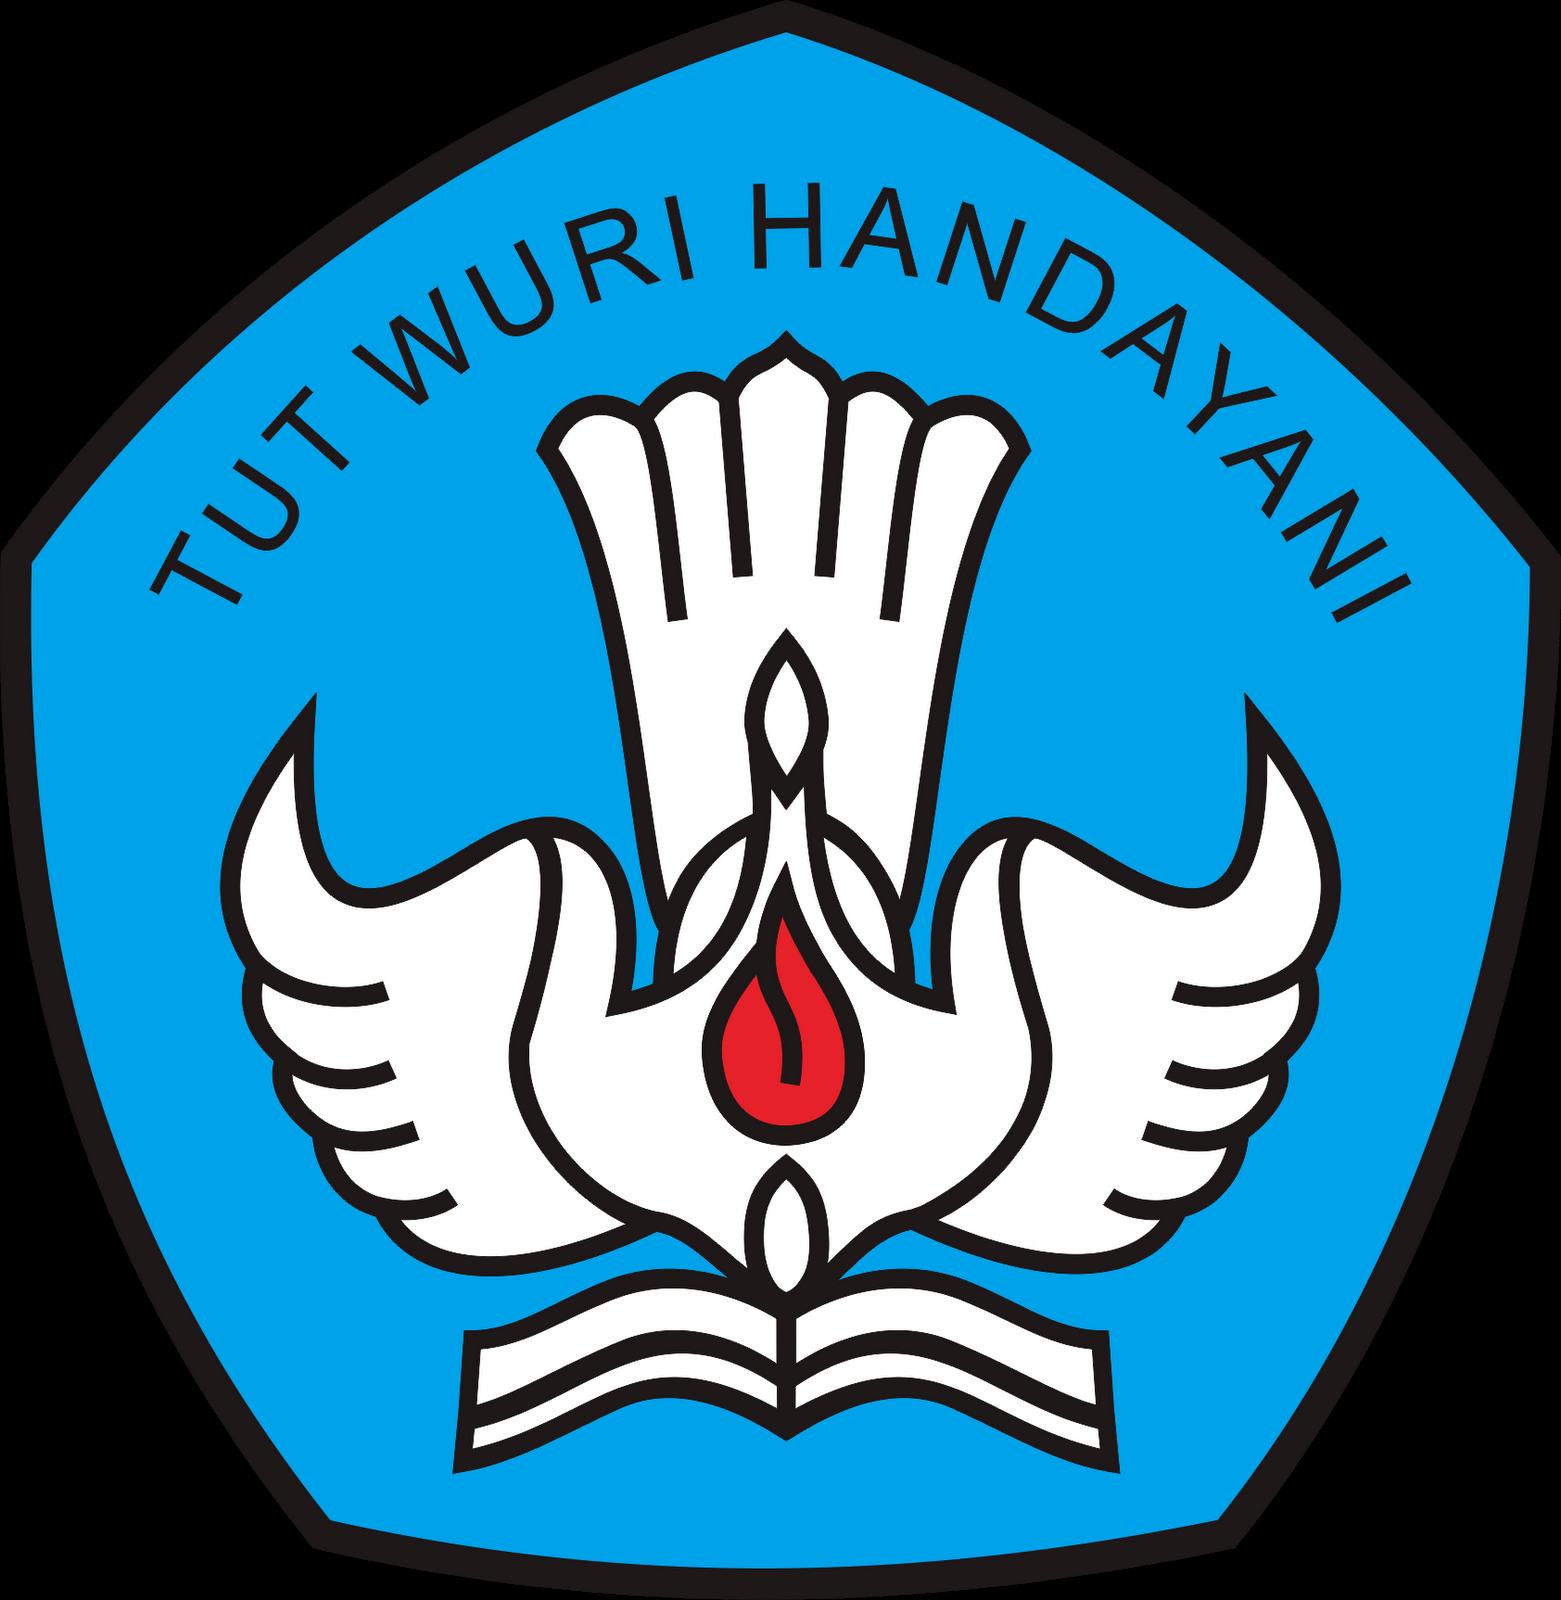 Hasil gambar untuk logo tut wuri handayani Sekolah